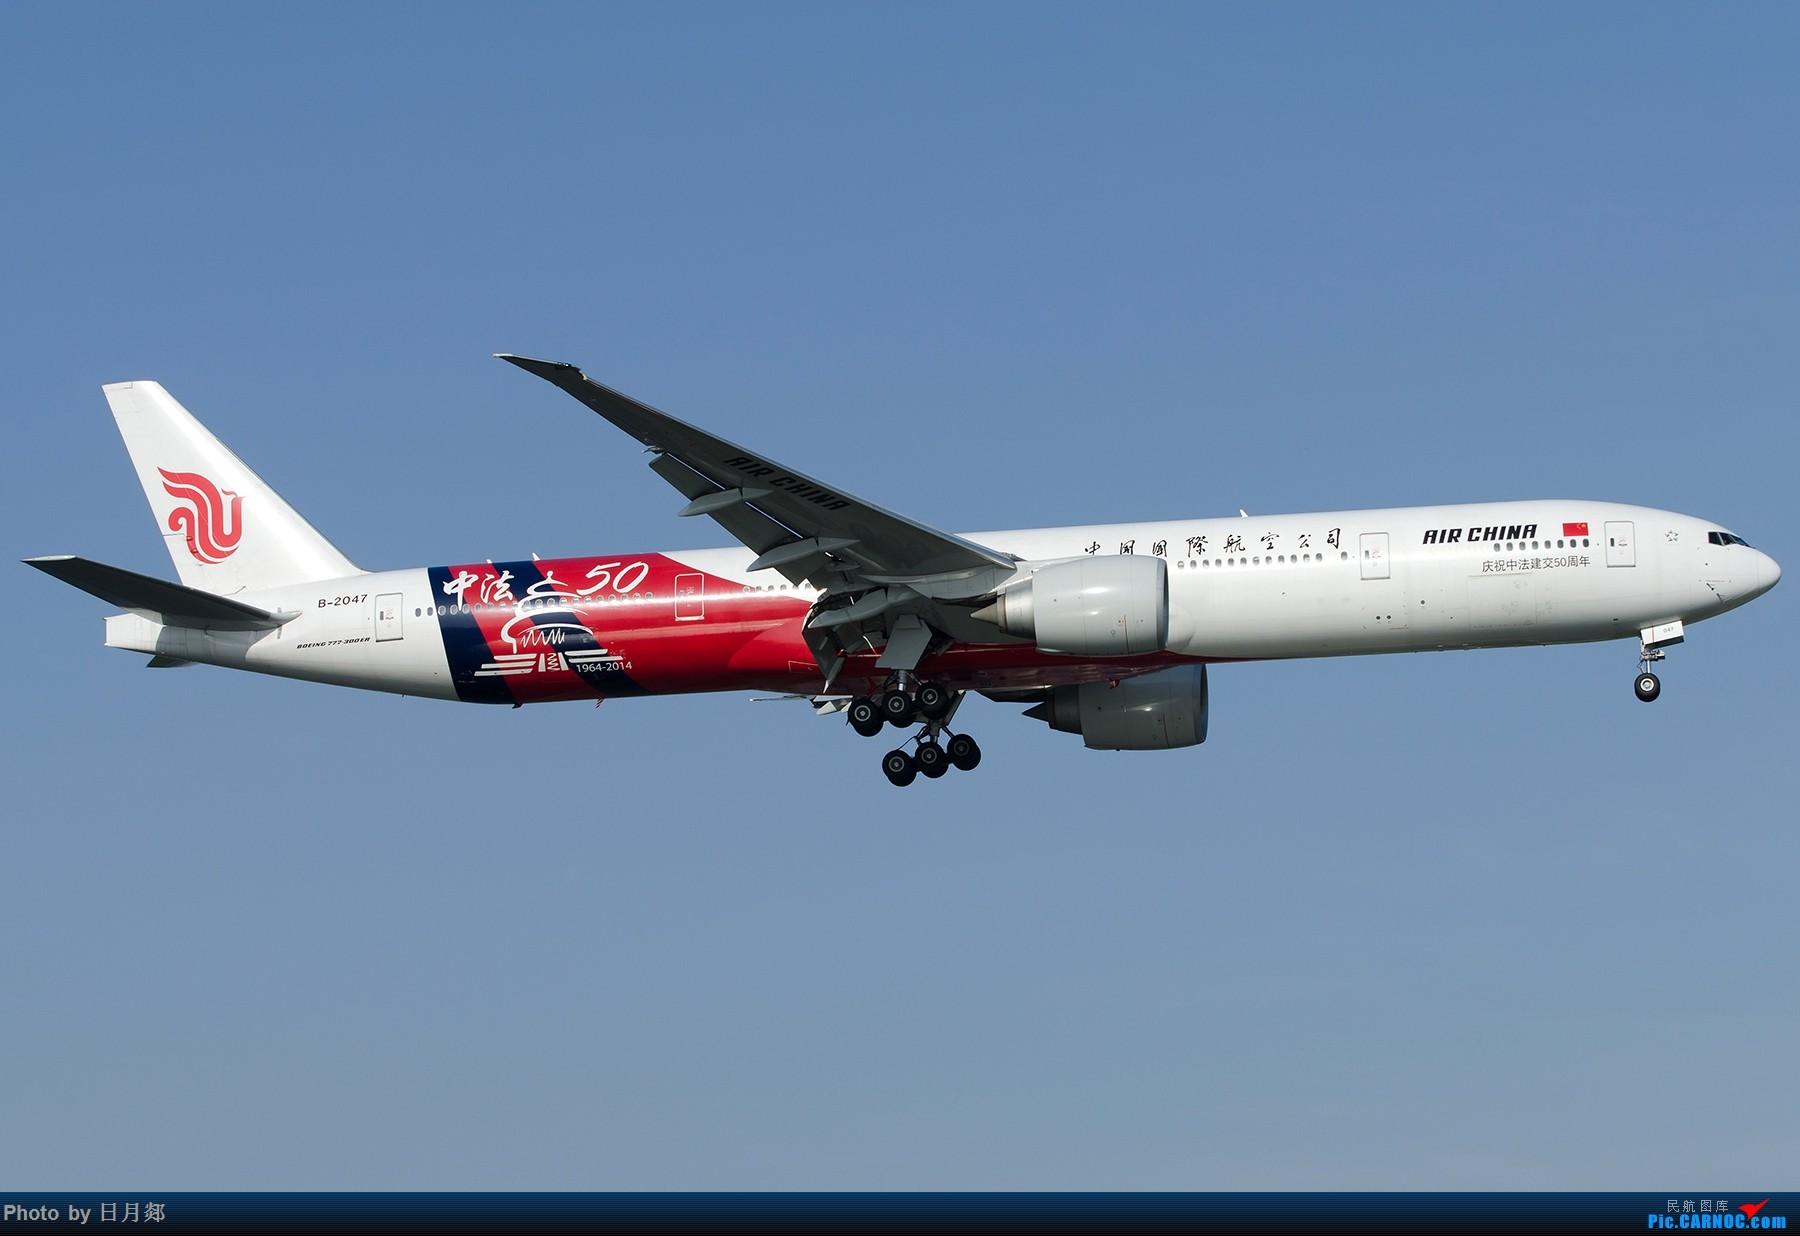 Re:[原创]【SHA拍机*1800大图】多图一机,中法50年 BOEING 777-300ER B-2047 中国上海虹桥国际机场